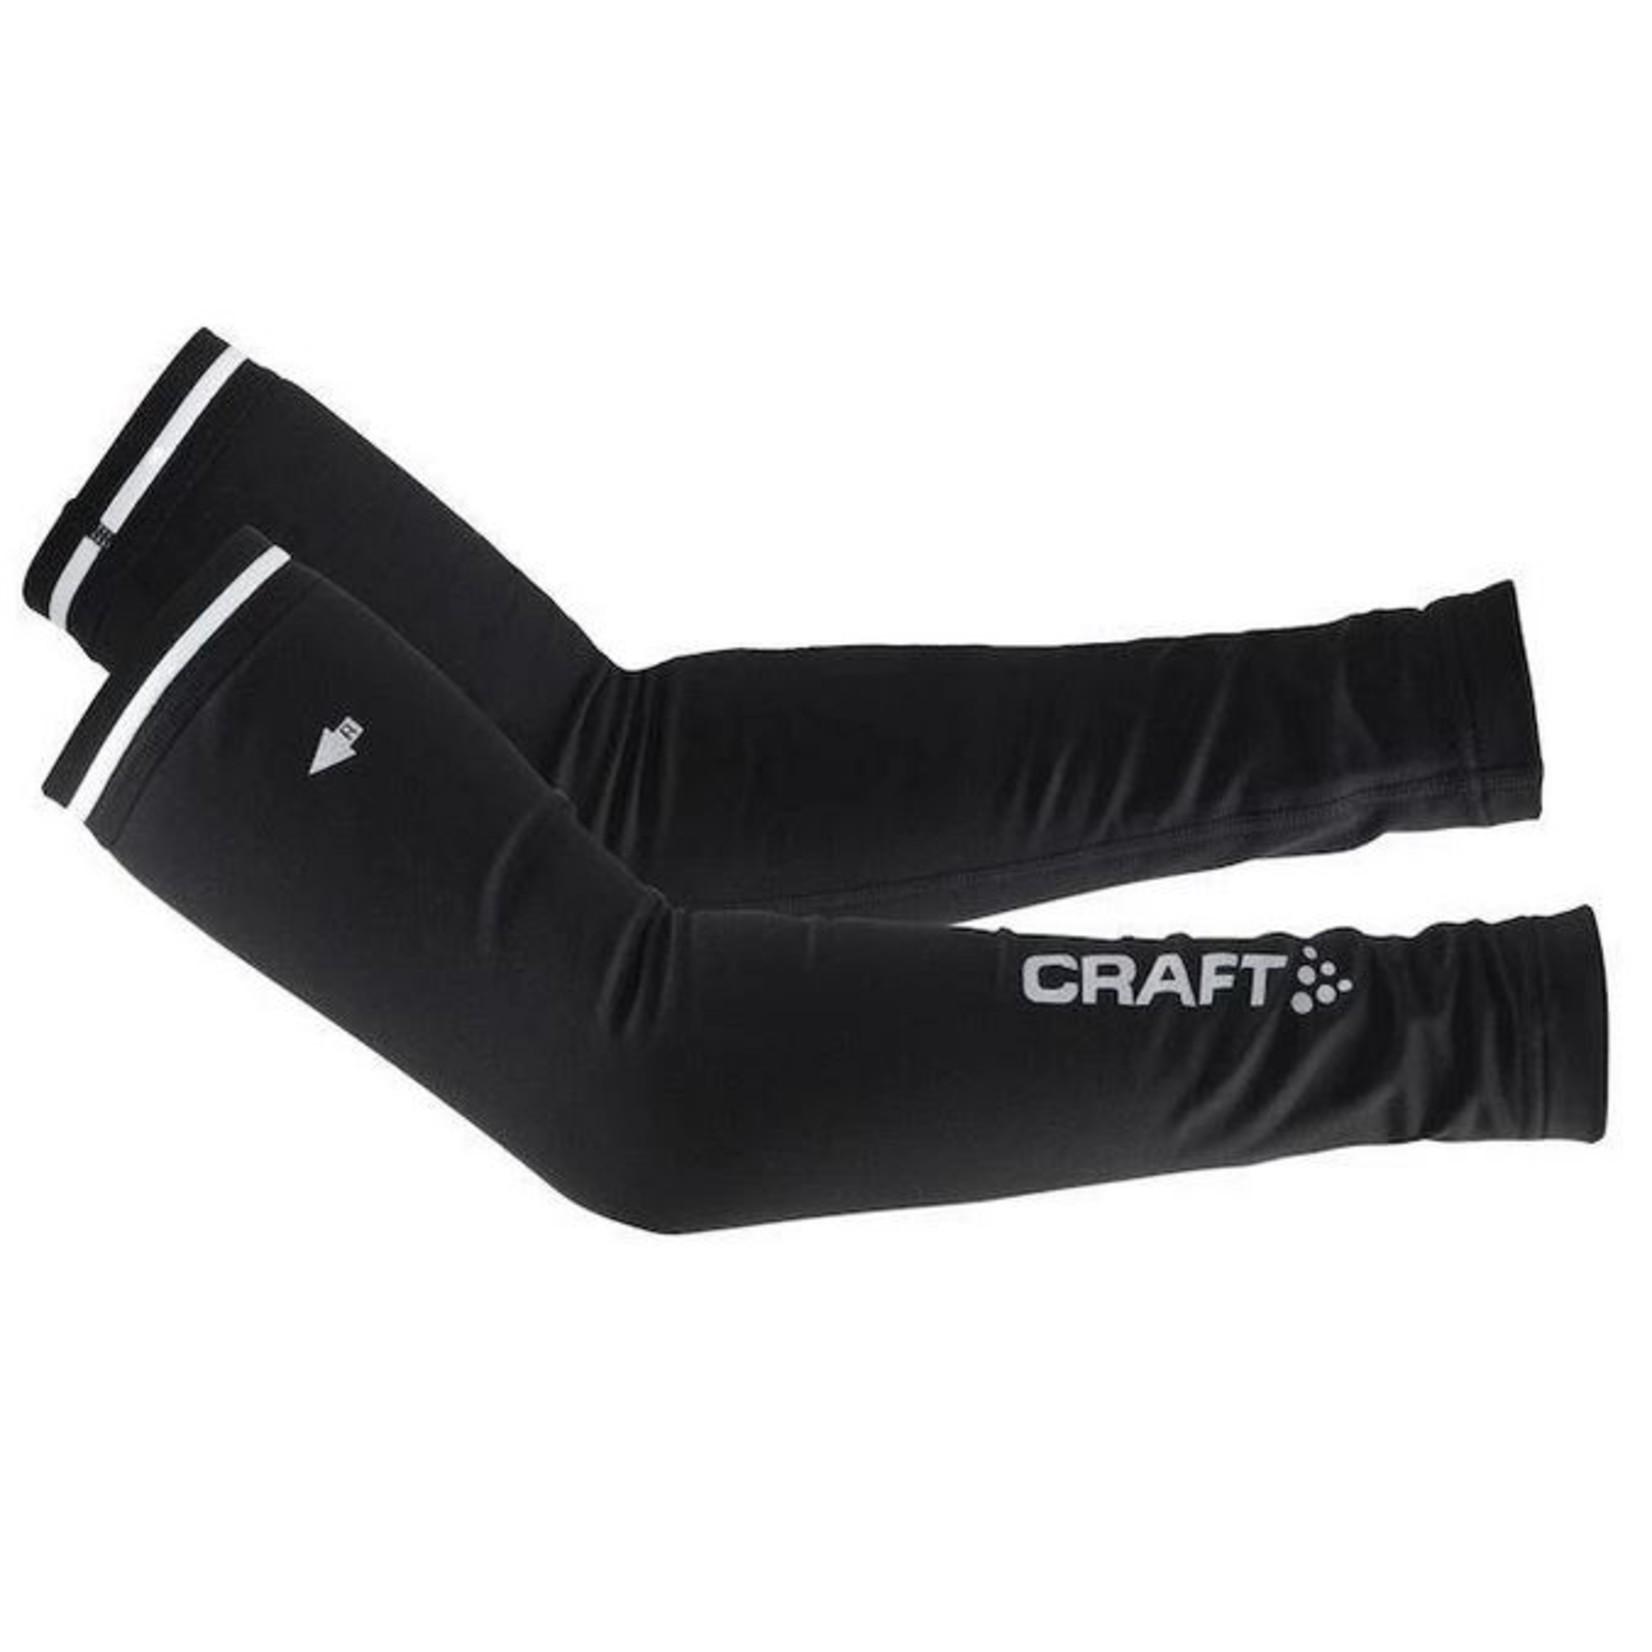 Craft Craft Arm Warmers